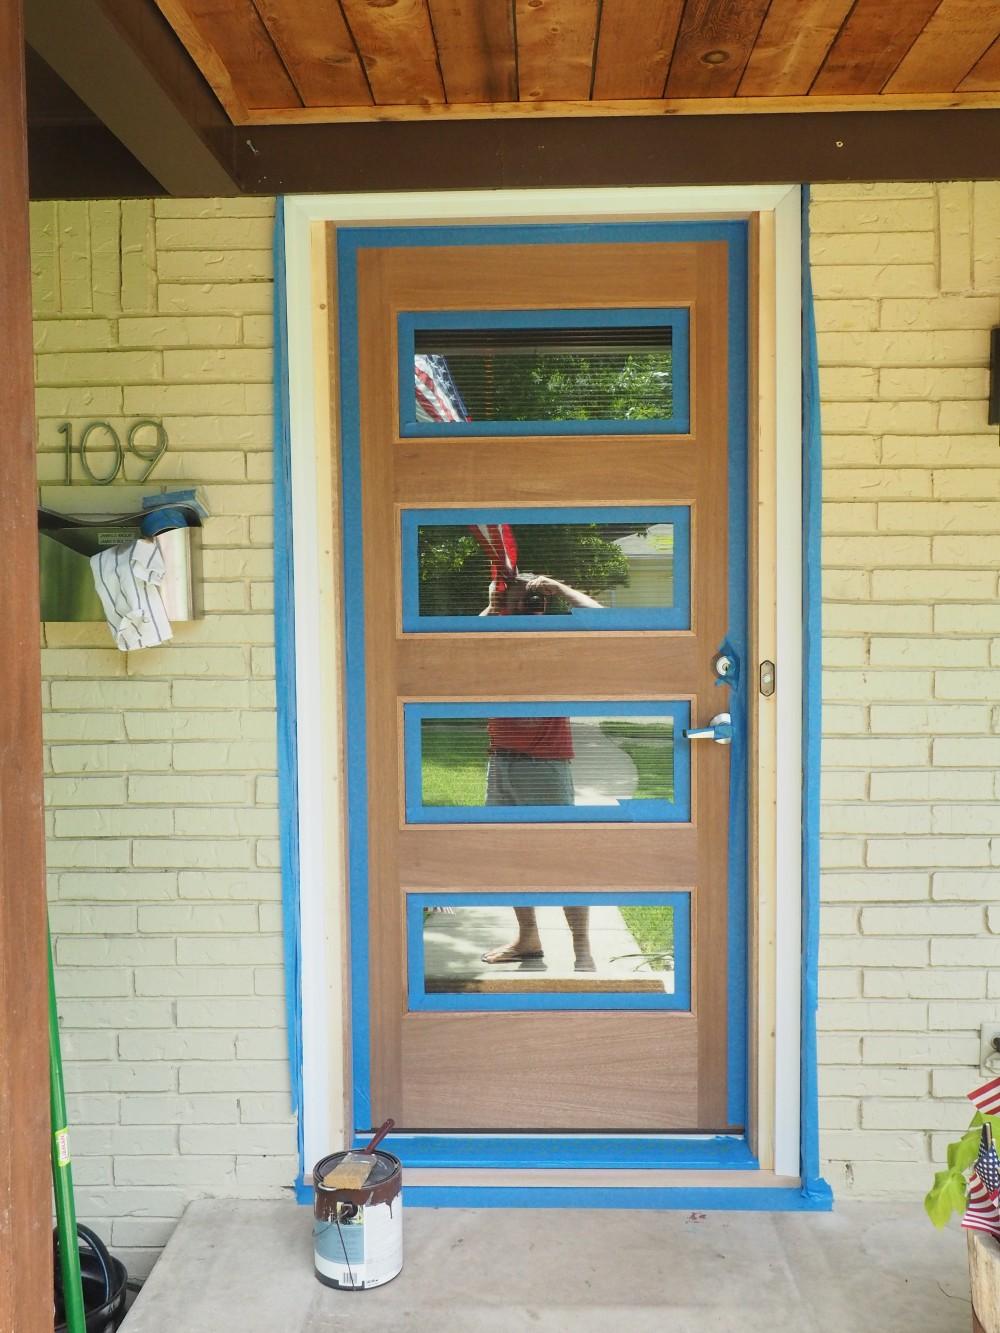 Modern Door with Blue Tape on Trim